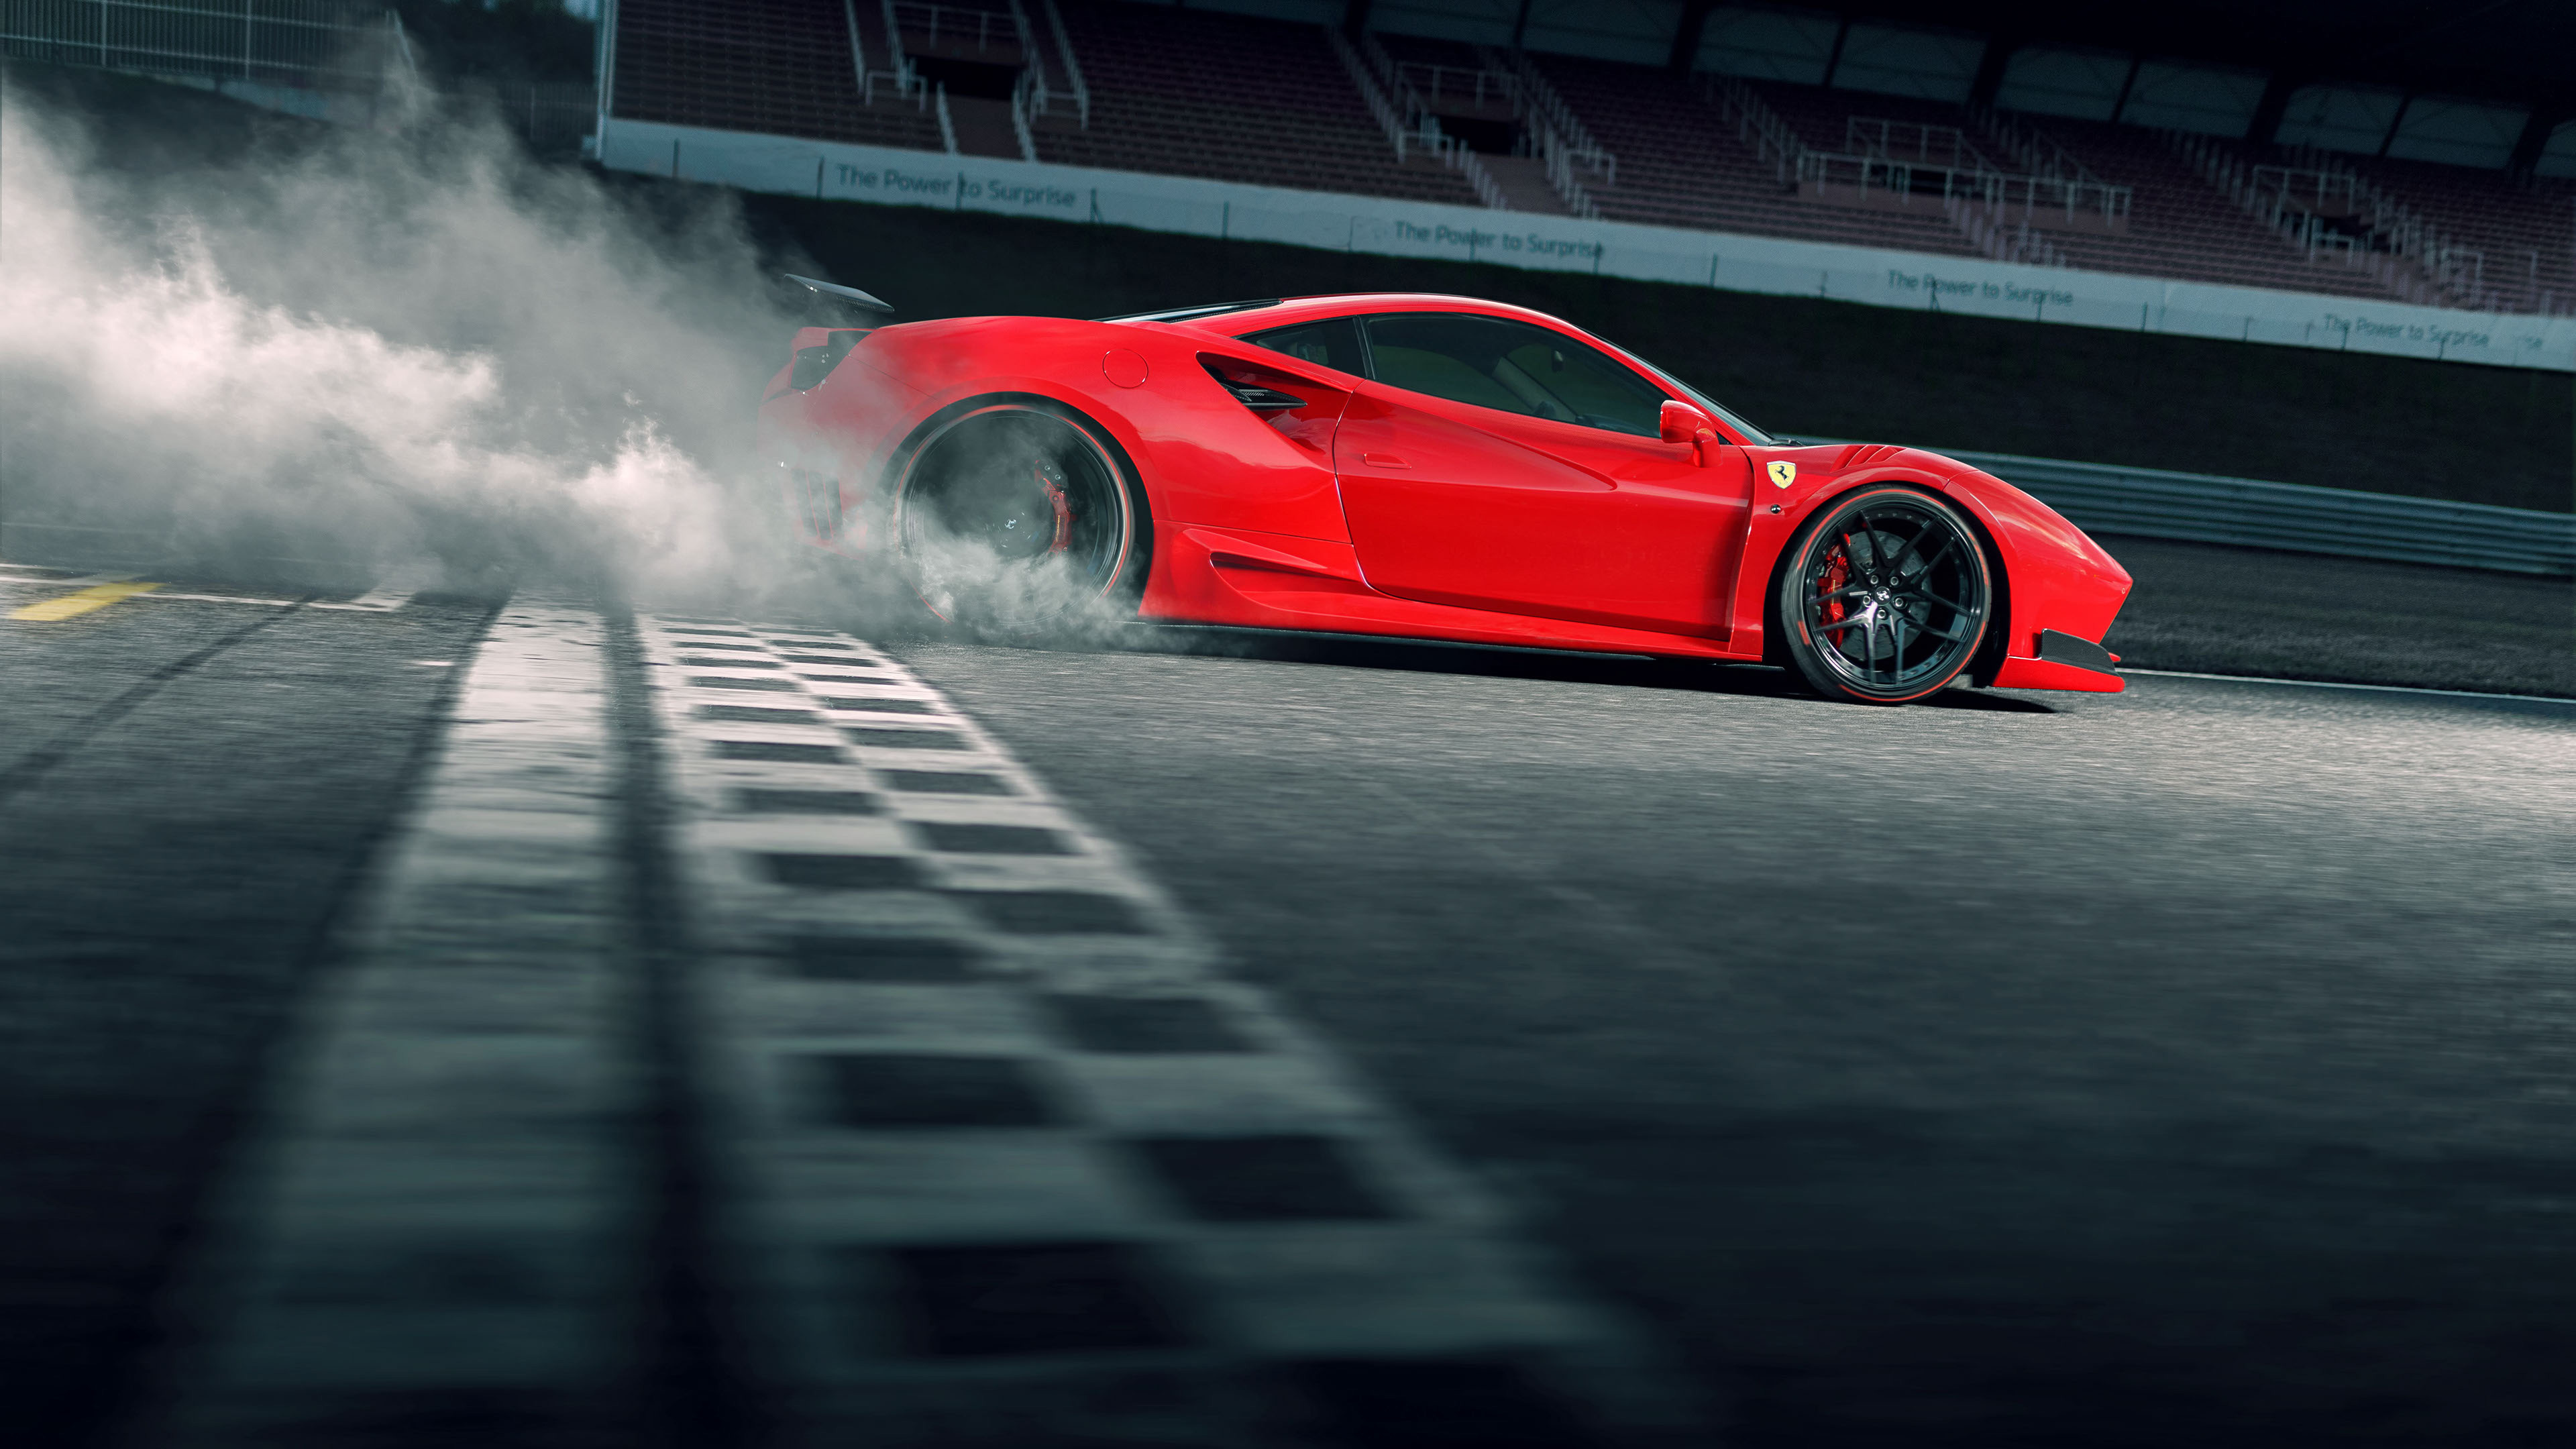 ferrari 488 gtb drifting 1539112168 - Ferrari 488 Gtb Drifting - hd-wallpapers, ferrari wallpapers, ferrari 488 wallpapers, drifting wallpapers, cars wallpapers, behance wallpapers, artist wallpapers, 4k-wallpapers